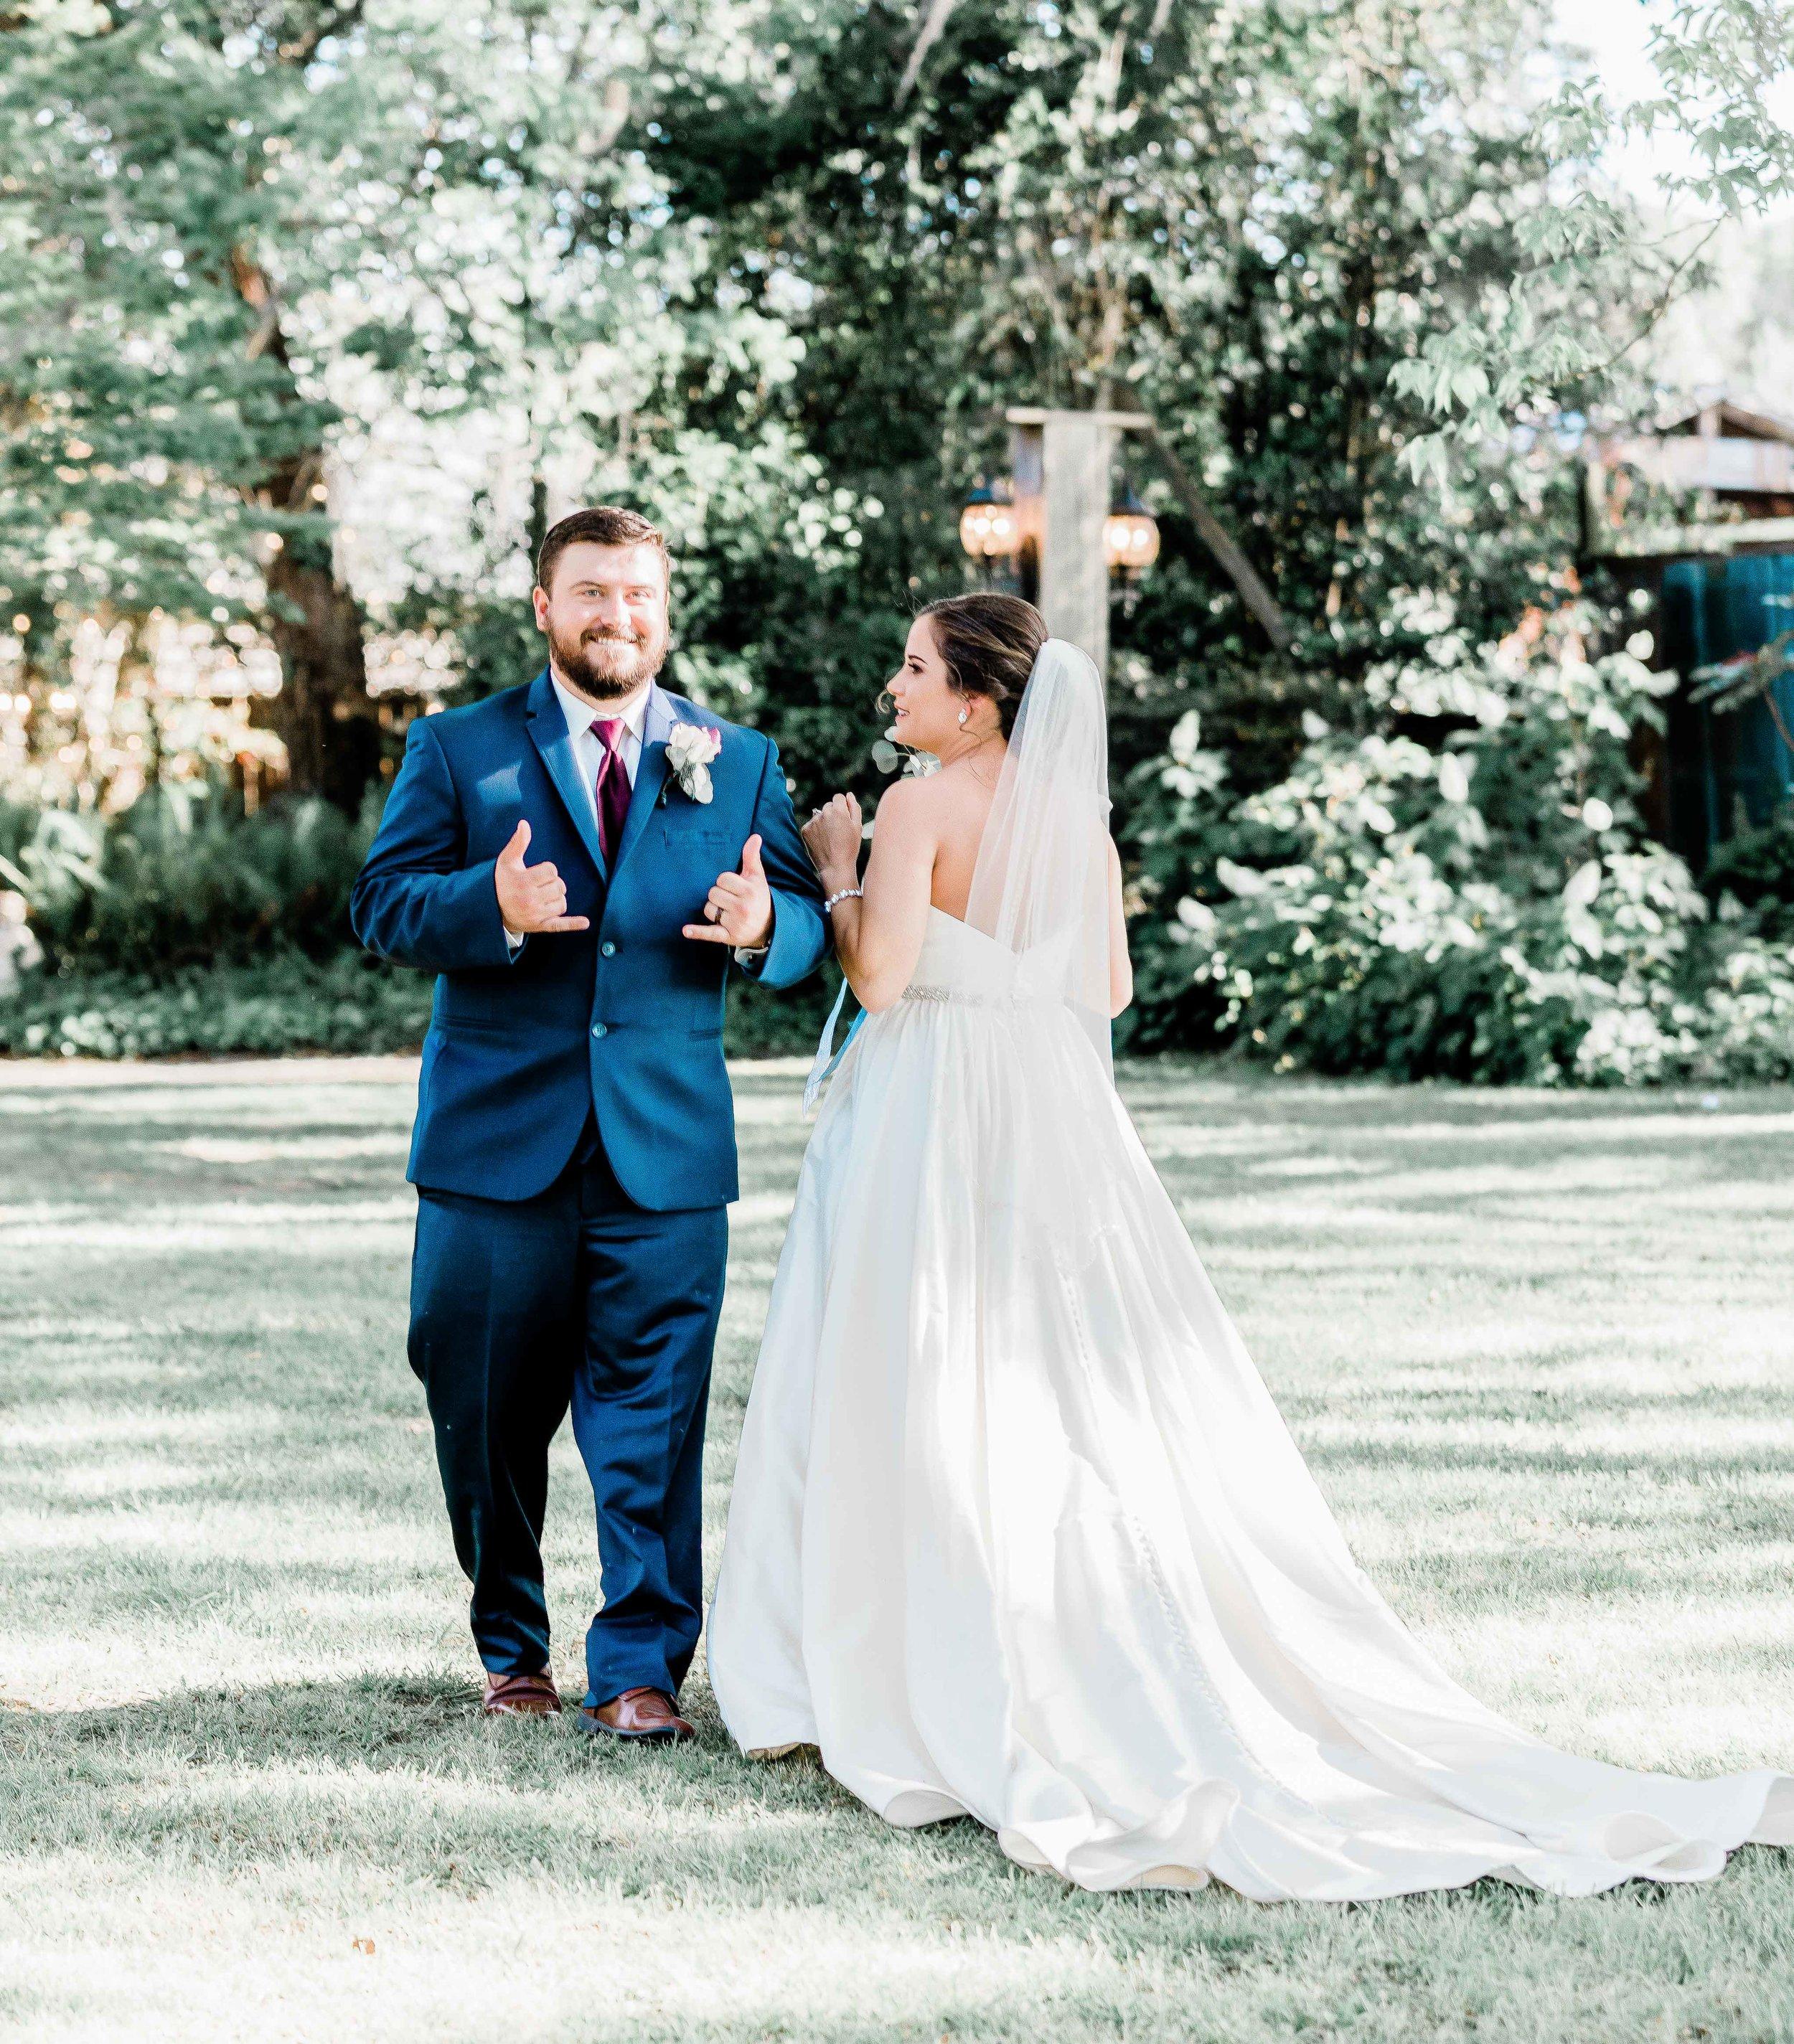 20190427-Southern Lens Photography- Savannah Wedding Photographer-Screven and Caroline-201972.jpg